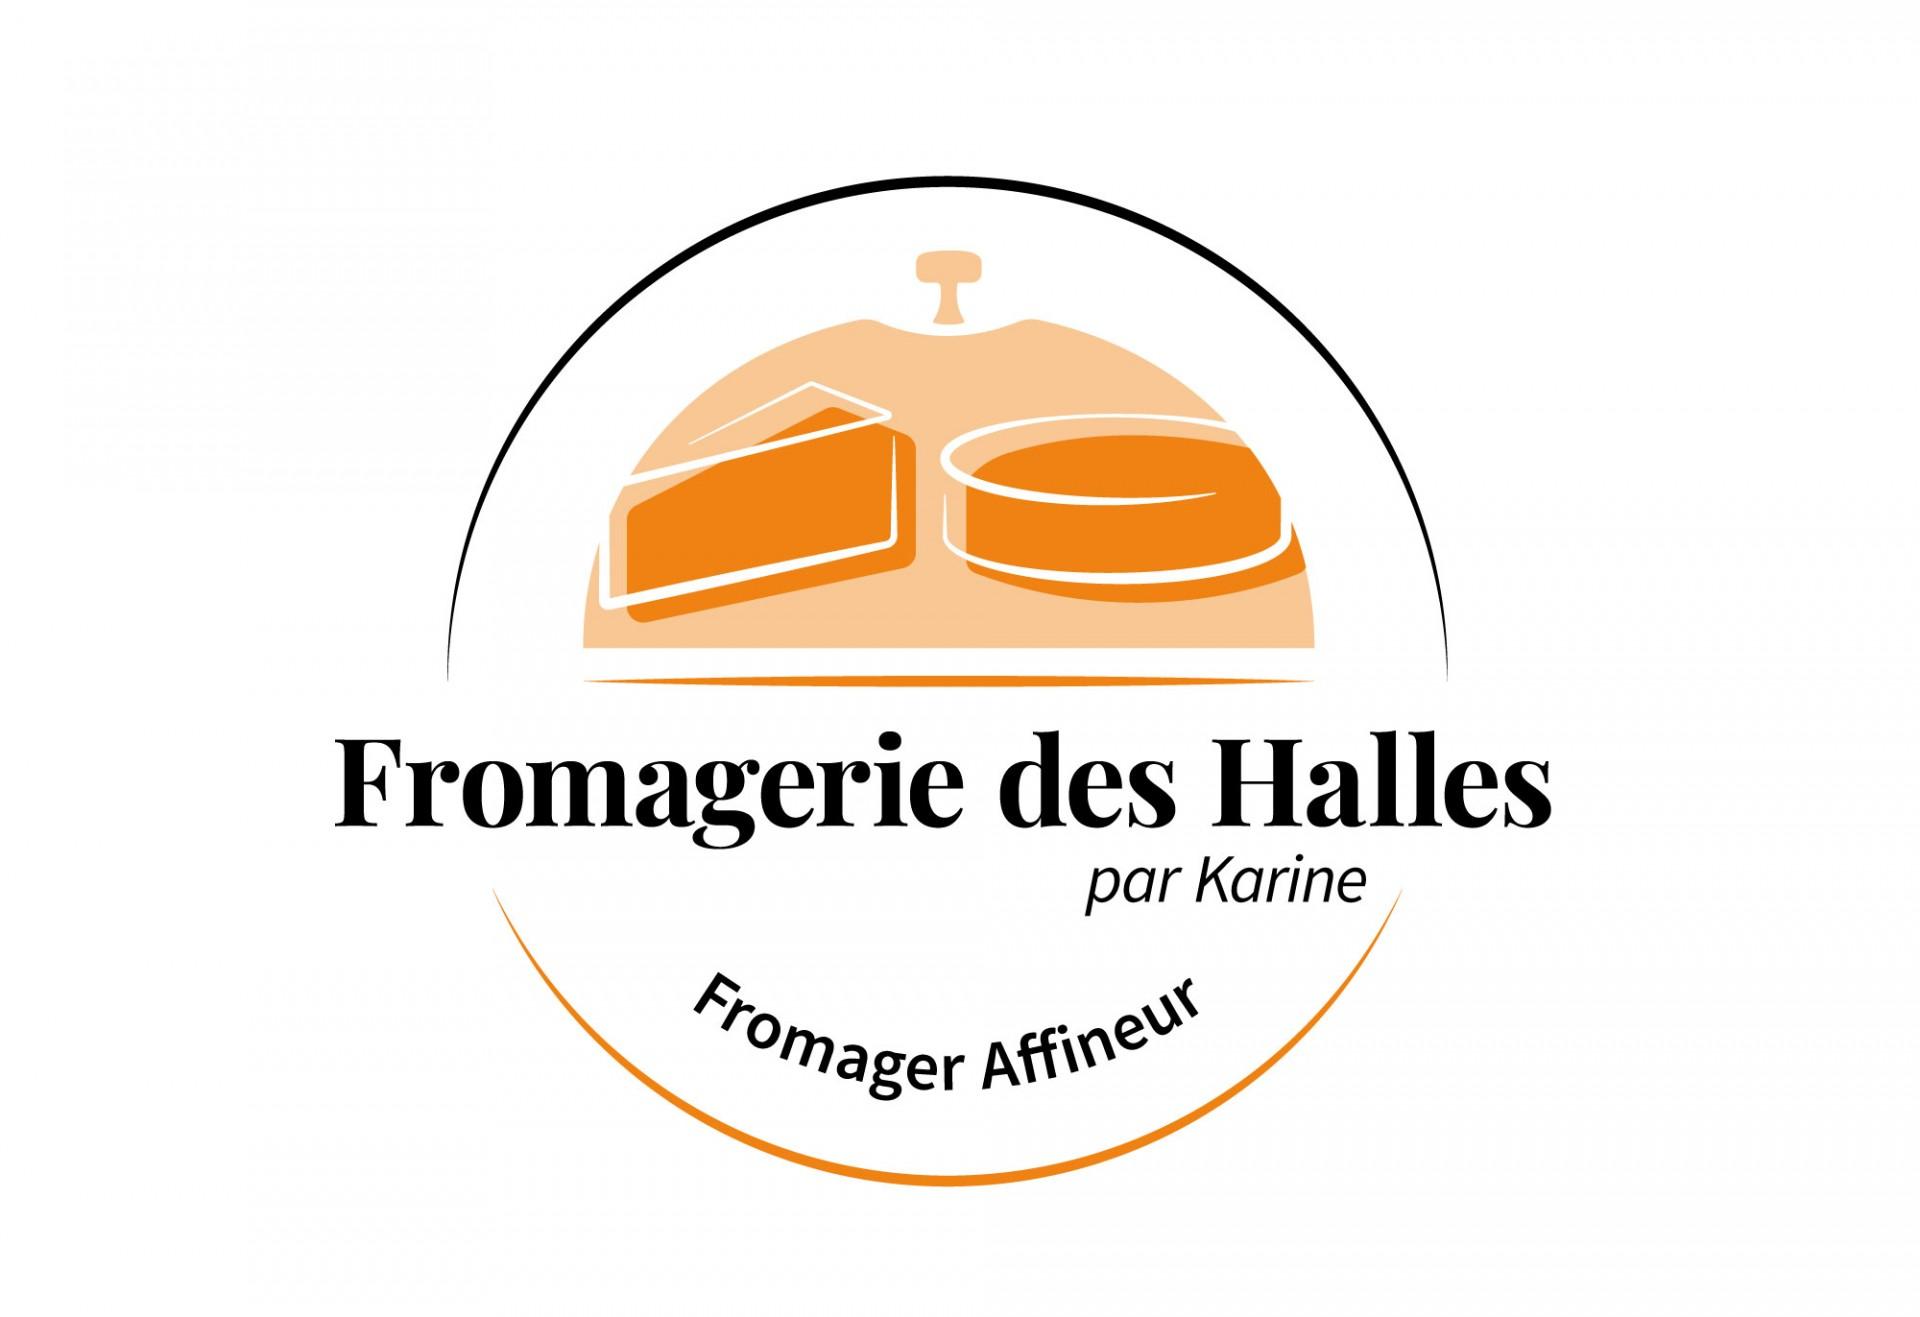 Fromagerie Des Halles